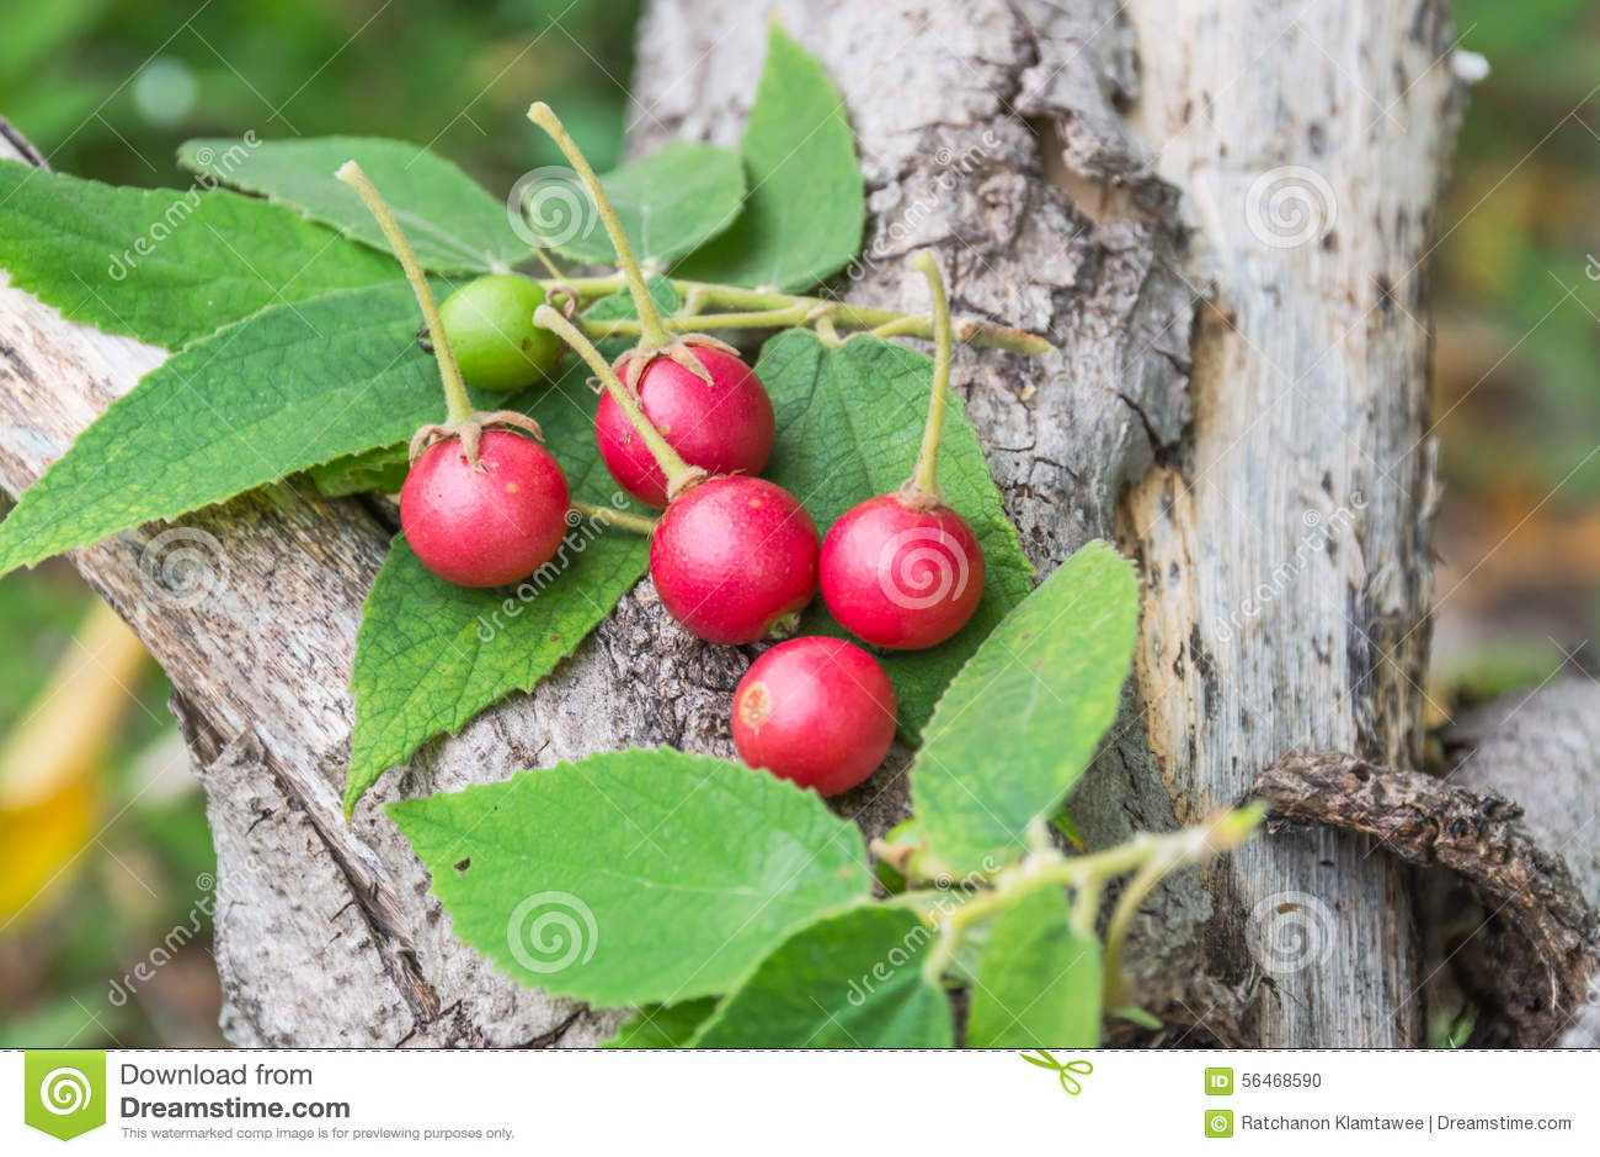 Capulin/Jamaican Cherry/Muntingia calabura | Zoom's Edible Plants